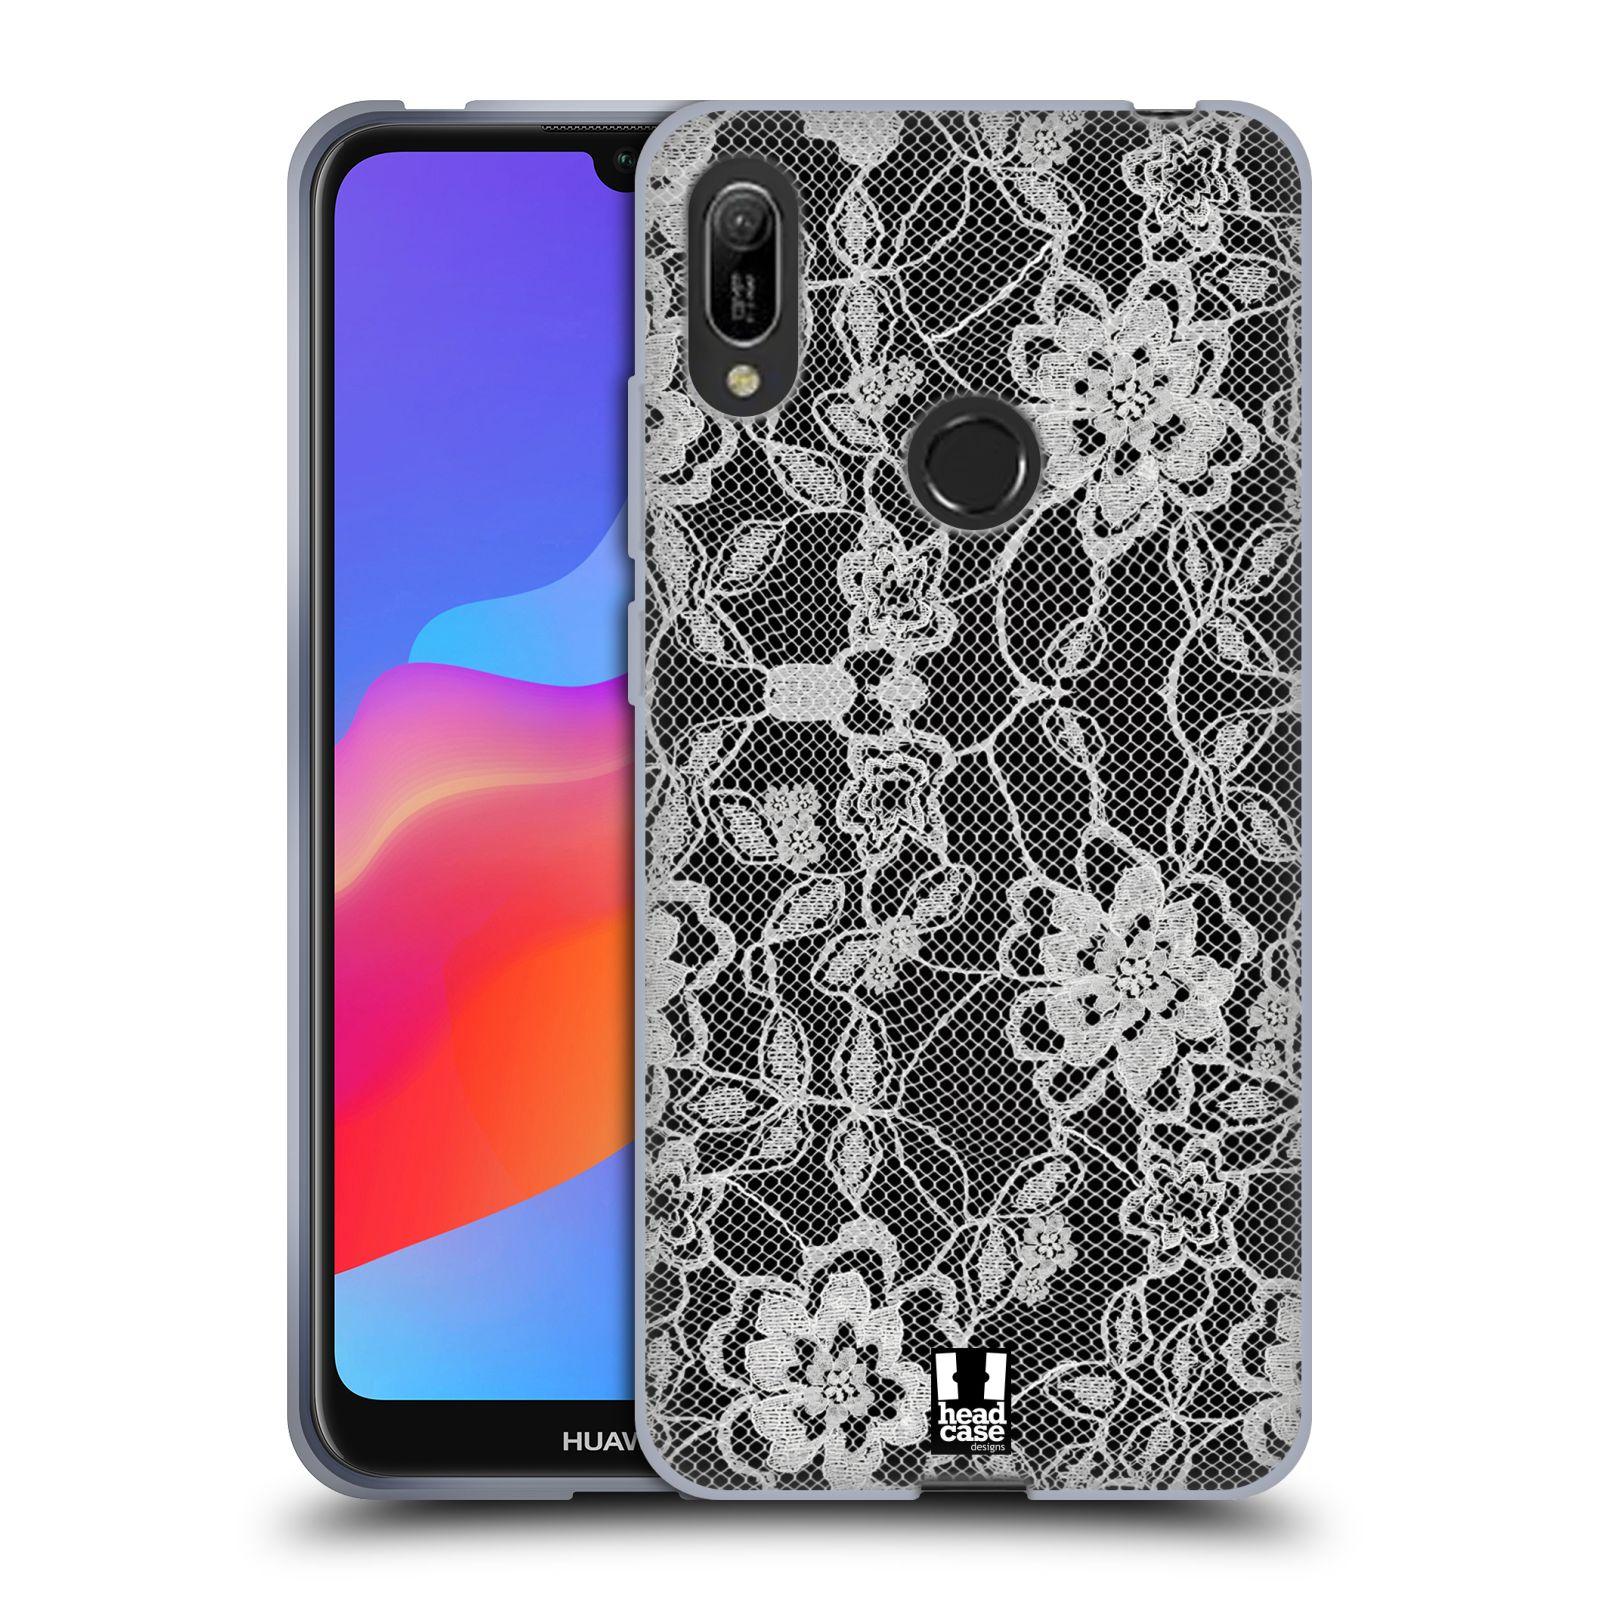 Silikonové pouzdro na mobil Huawei Y6 (2019) - Head Case - FLOWERY KRAJKA